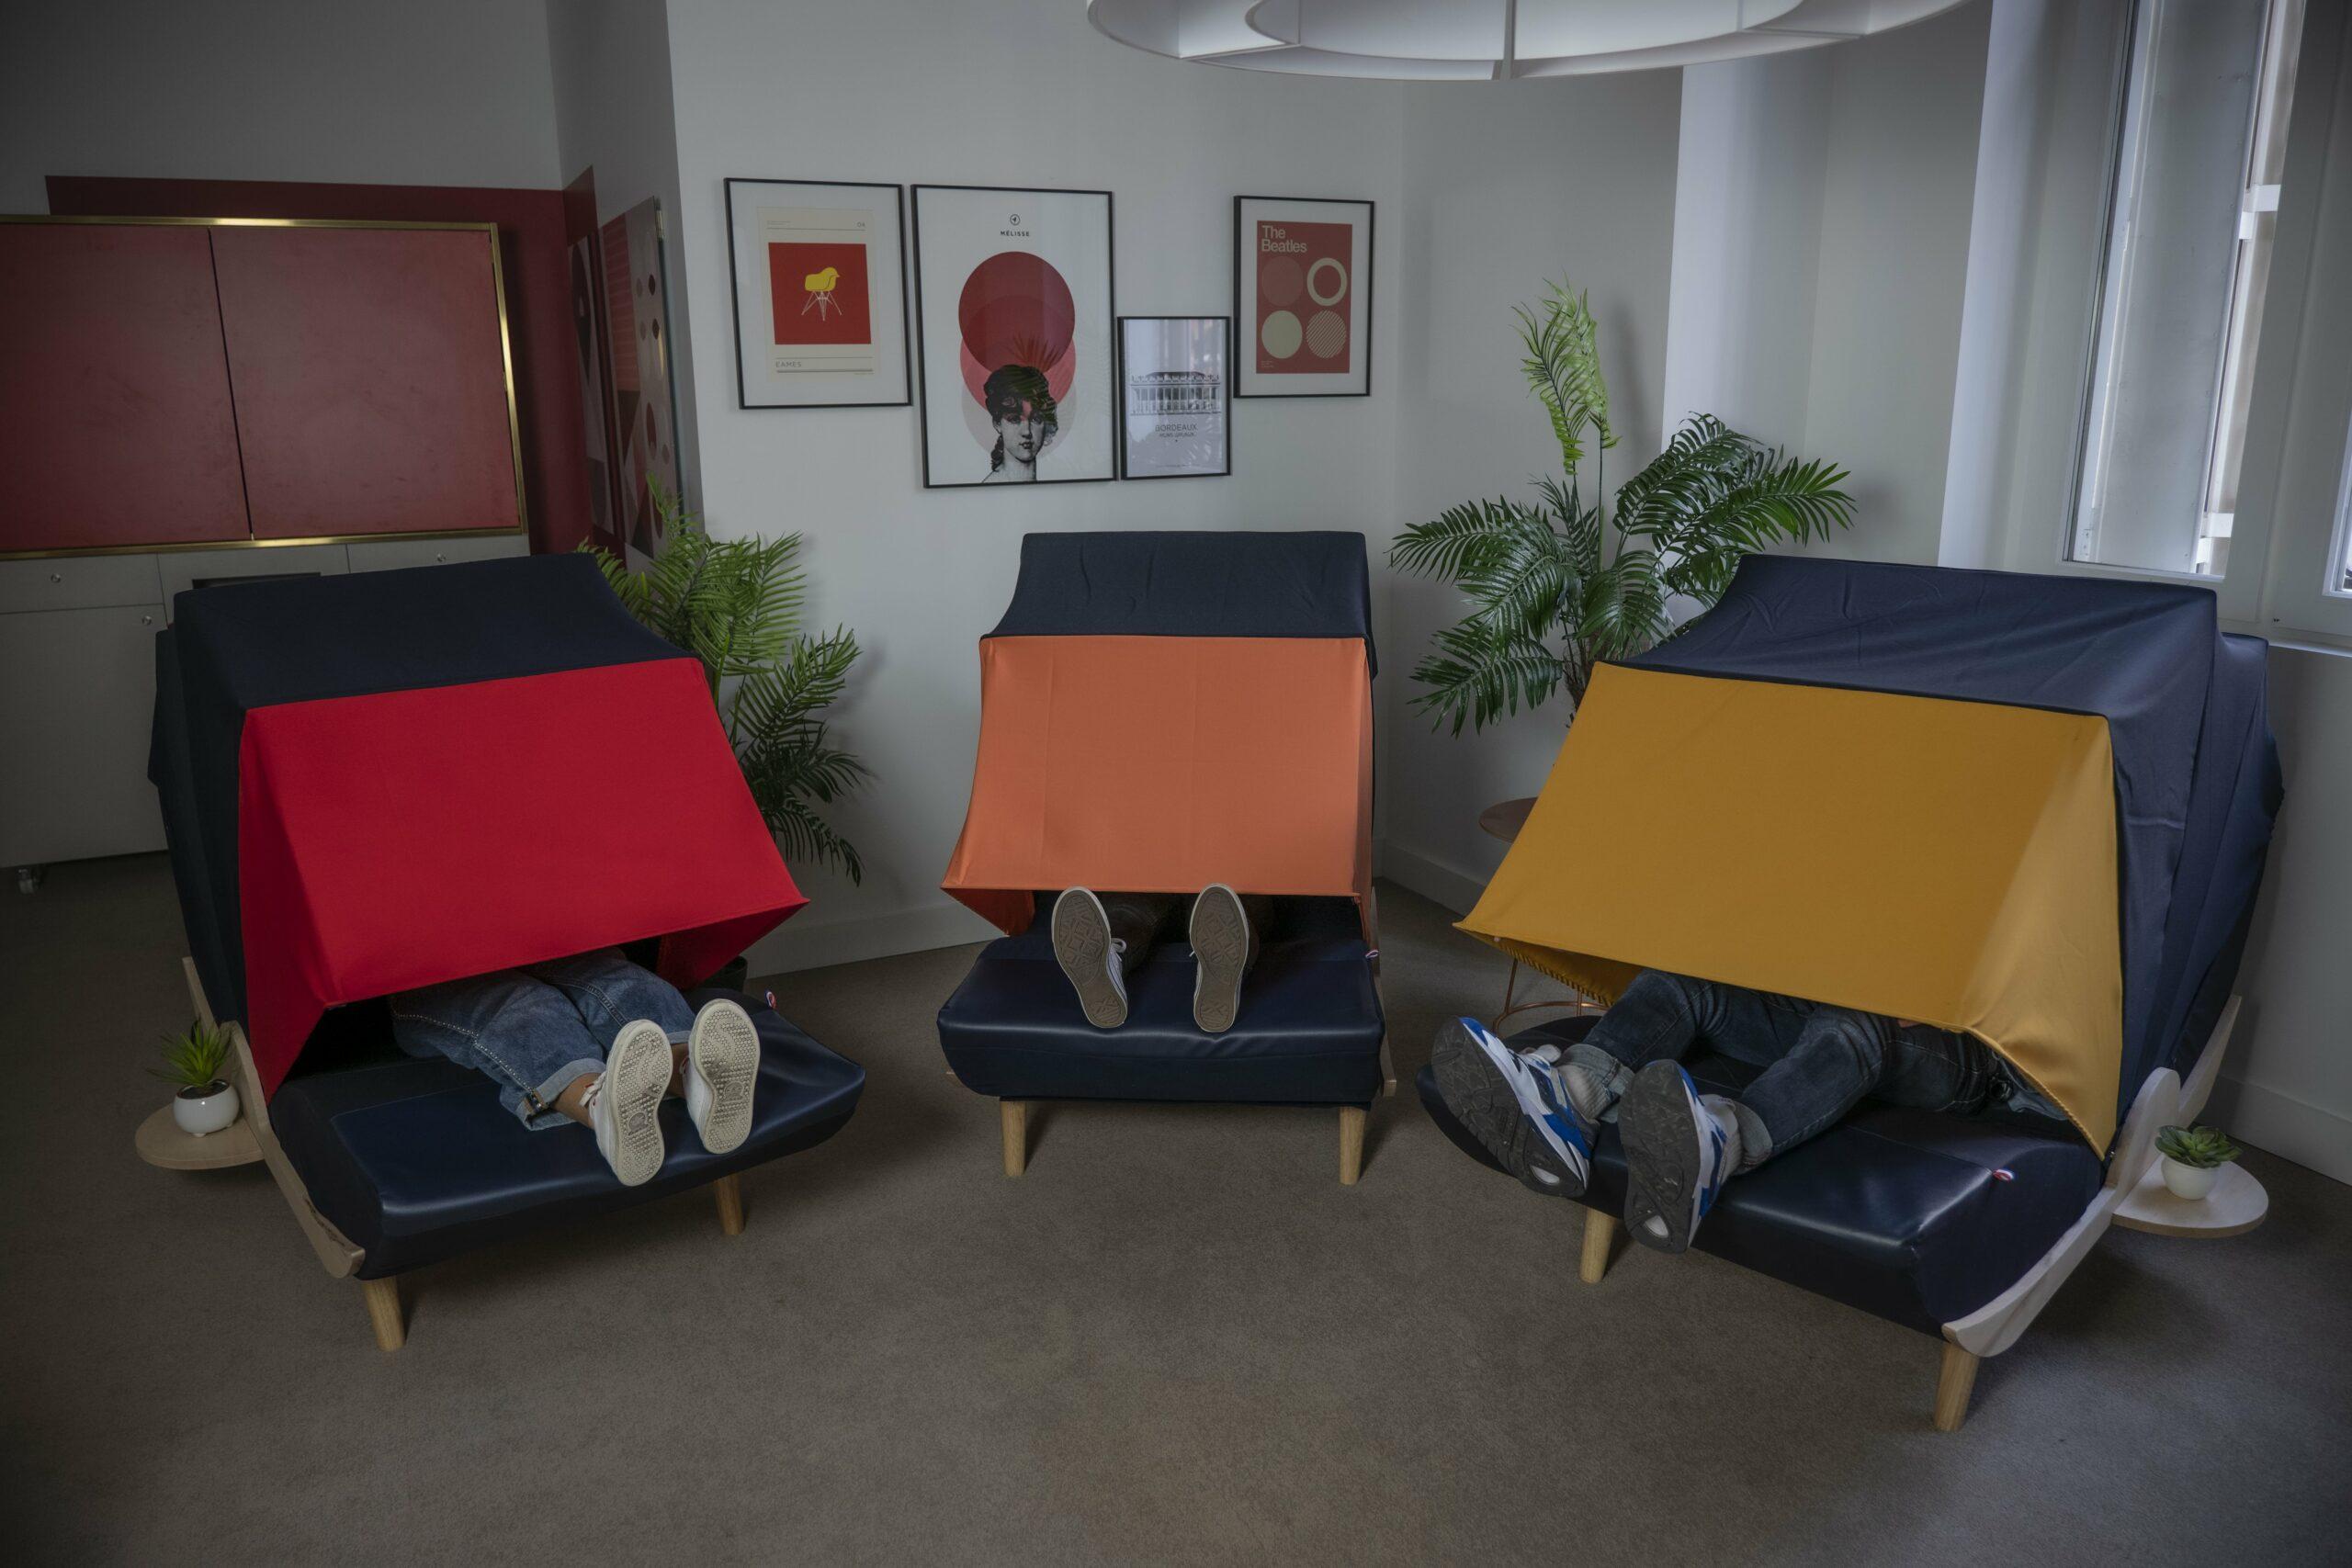 Installation d'un espace de sieste